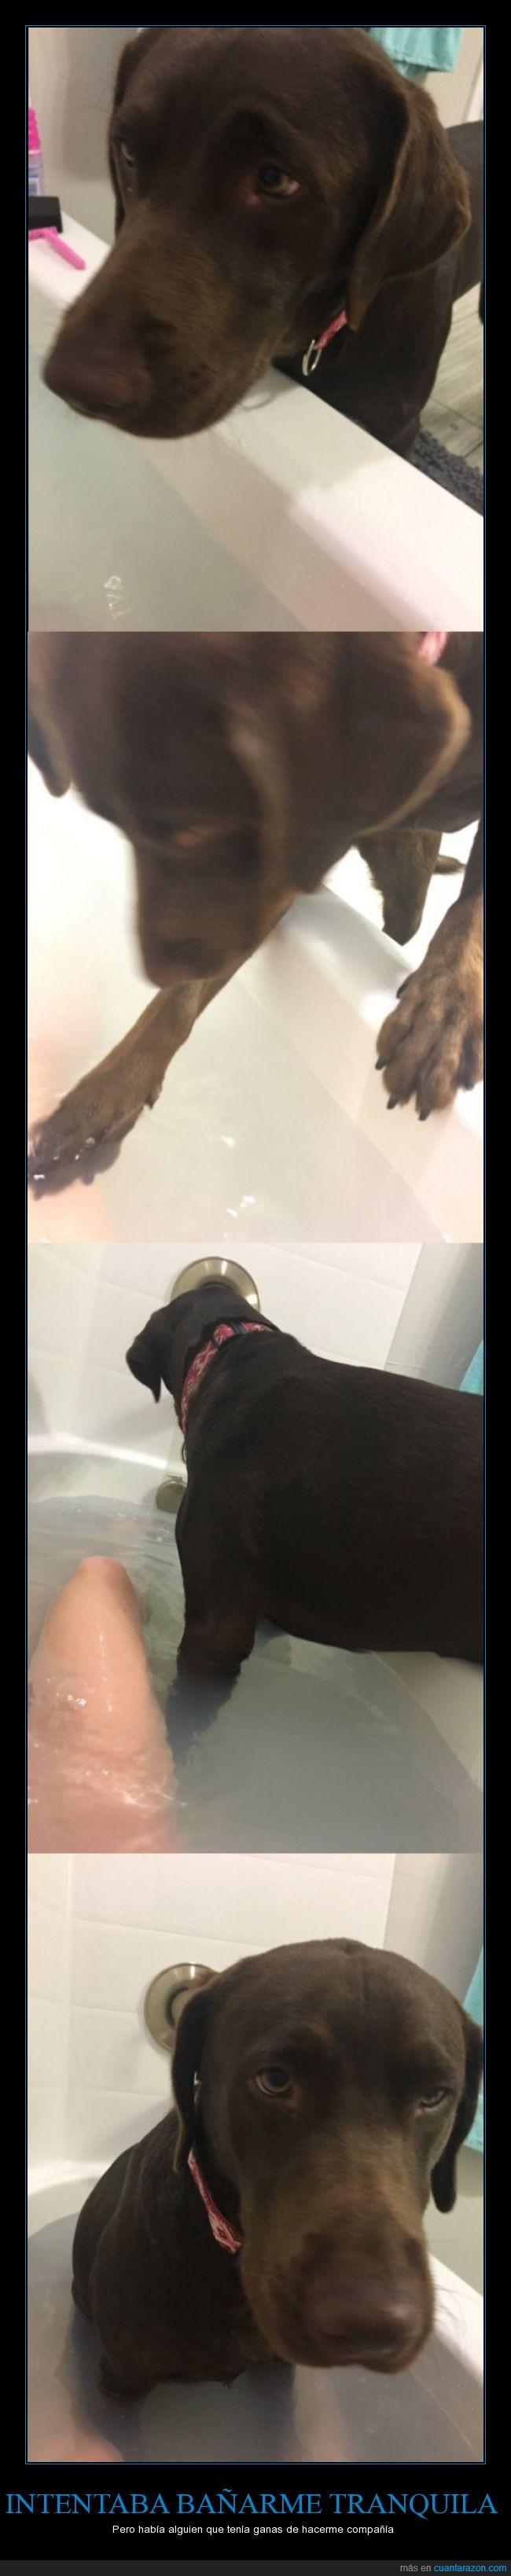 agua,bañar,bañera,compañía,mascota,meter,perra,perro